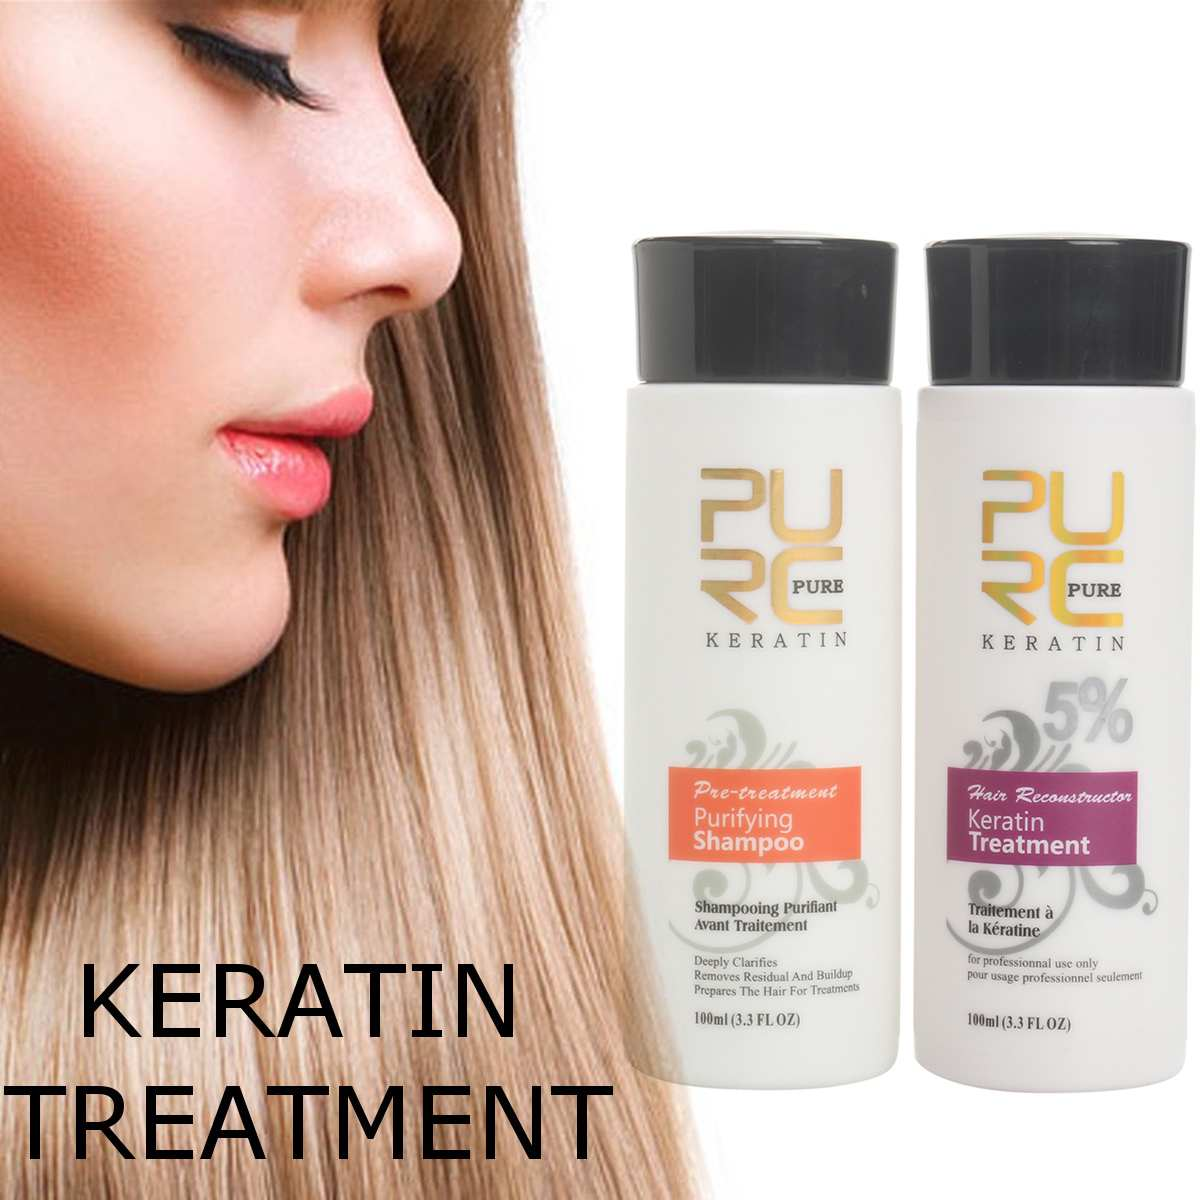 Purc brasileiro queratina cabelo endireitar 100ml x 2 produtos de cuidados capilares para reparação danificado cabelo & alisar queratina cuidados capilares